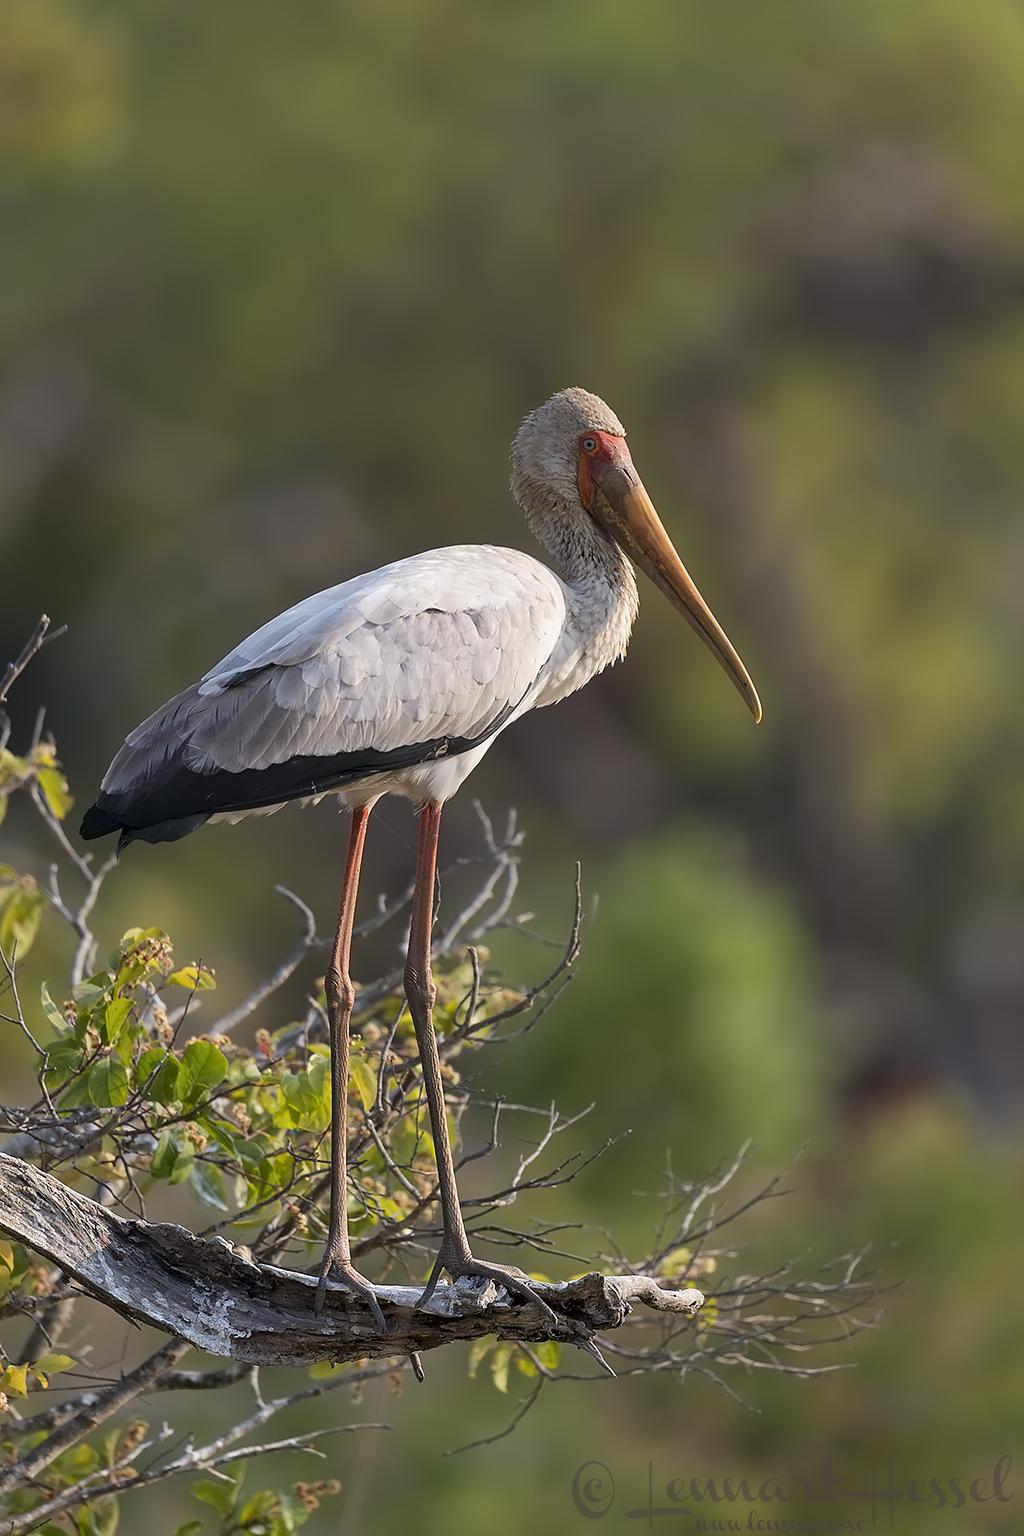 Yellow-billed Stork Kafue National Park